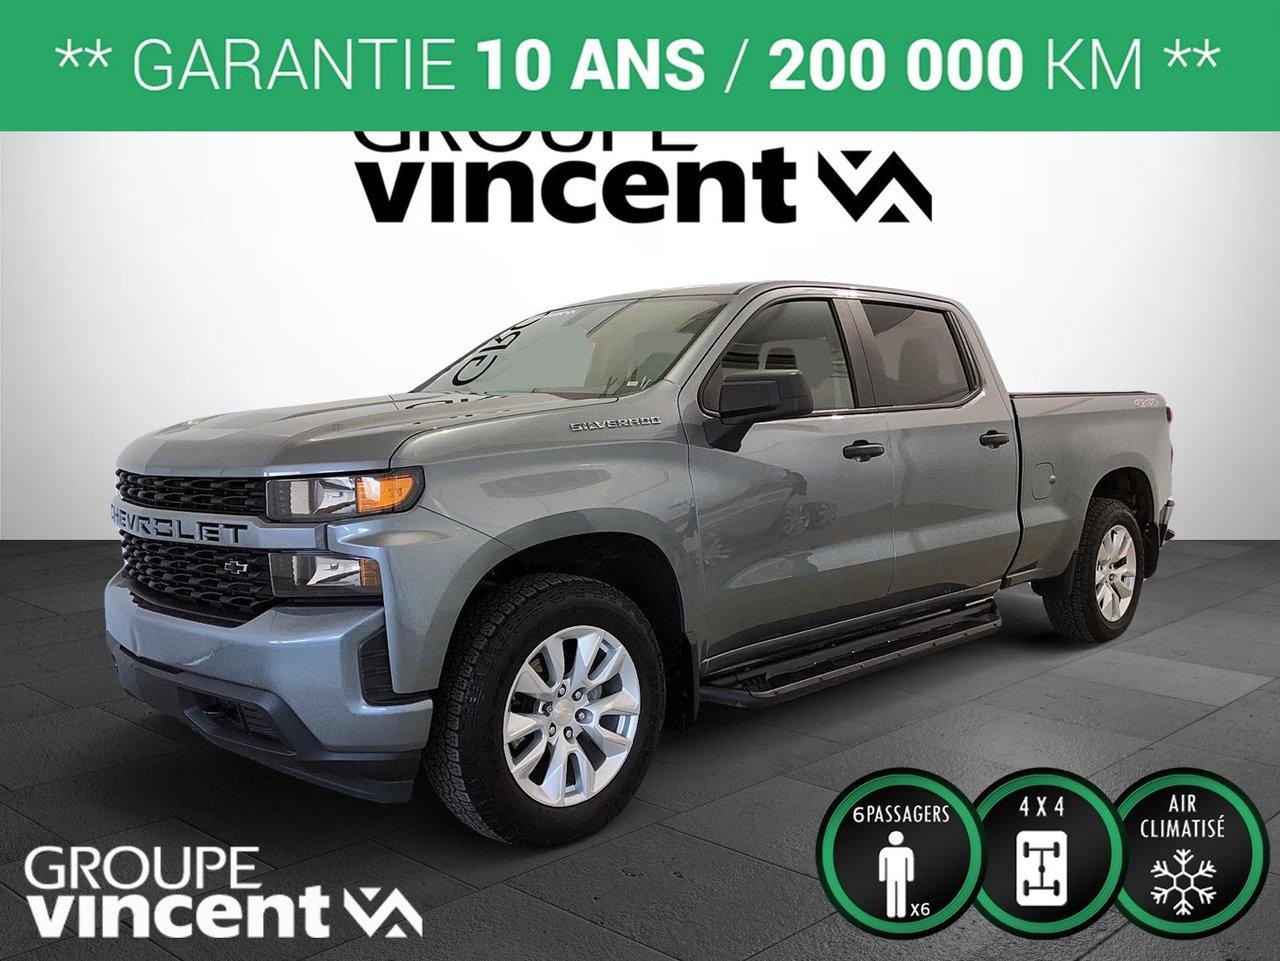 Chevrolet Silverado 1500 2019 1500 CUSTOM 4X4 CREW CAB ** GARANTIE 10 ANS *